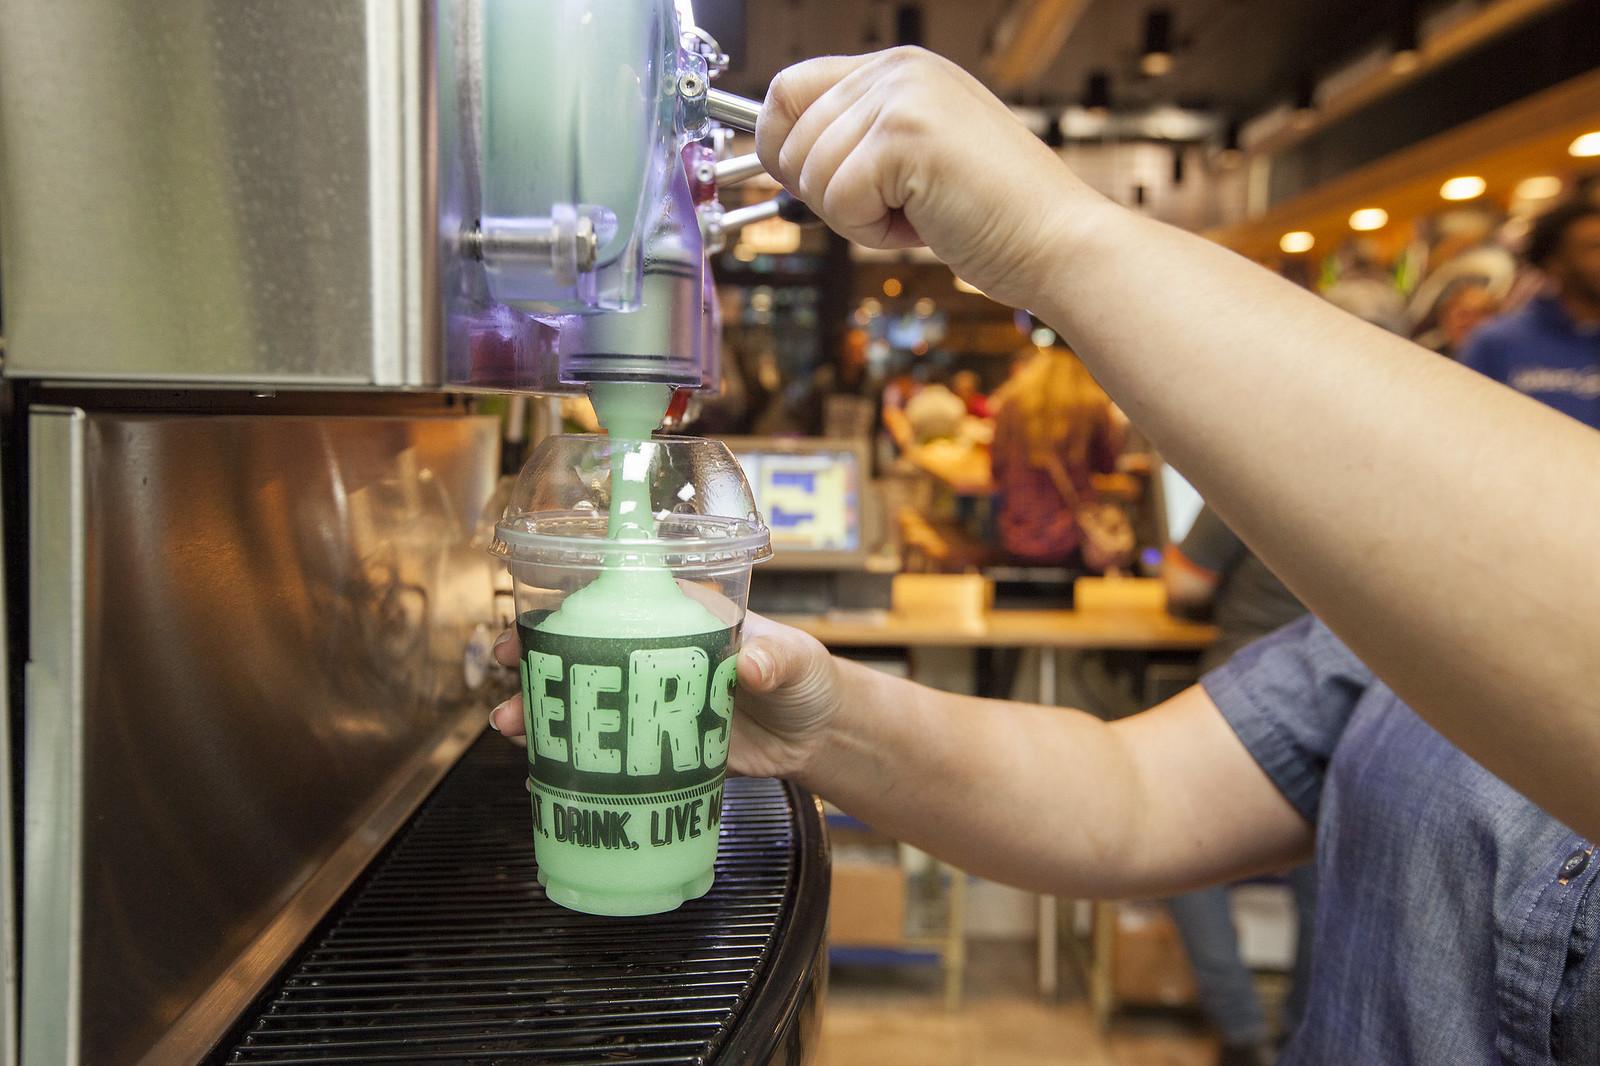 A slushie machine pouring a green slushie into a plastic cup.